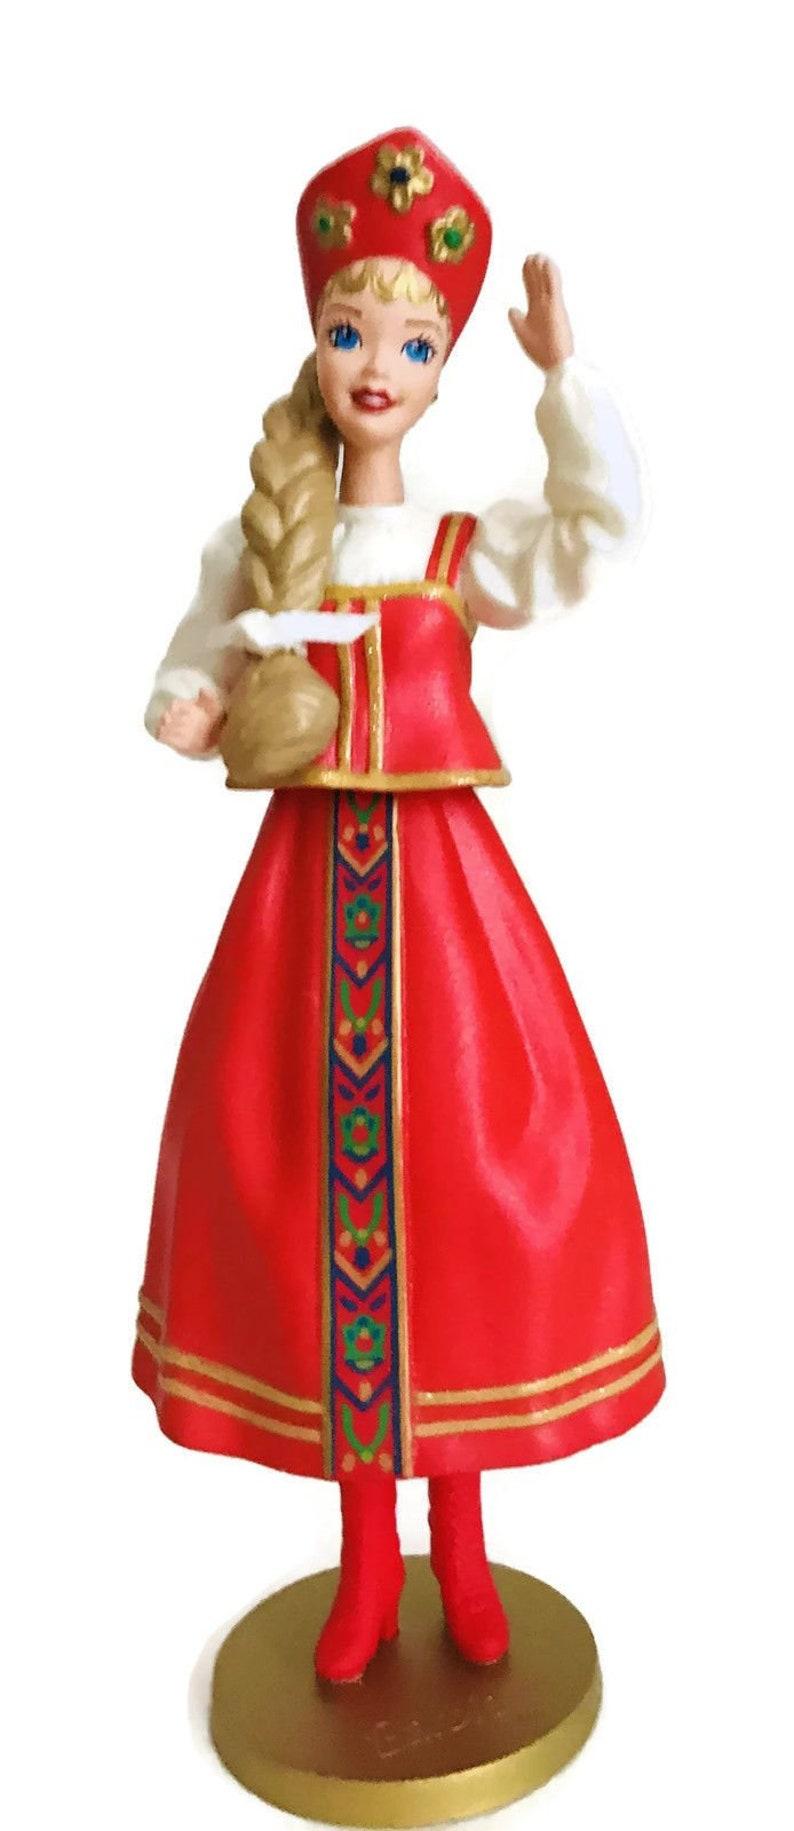 1999 Hallmark Keepsake Ornament Russian Barbie Collectors Series QX6369